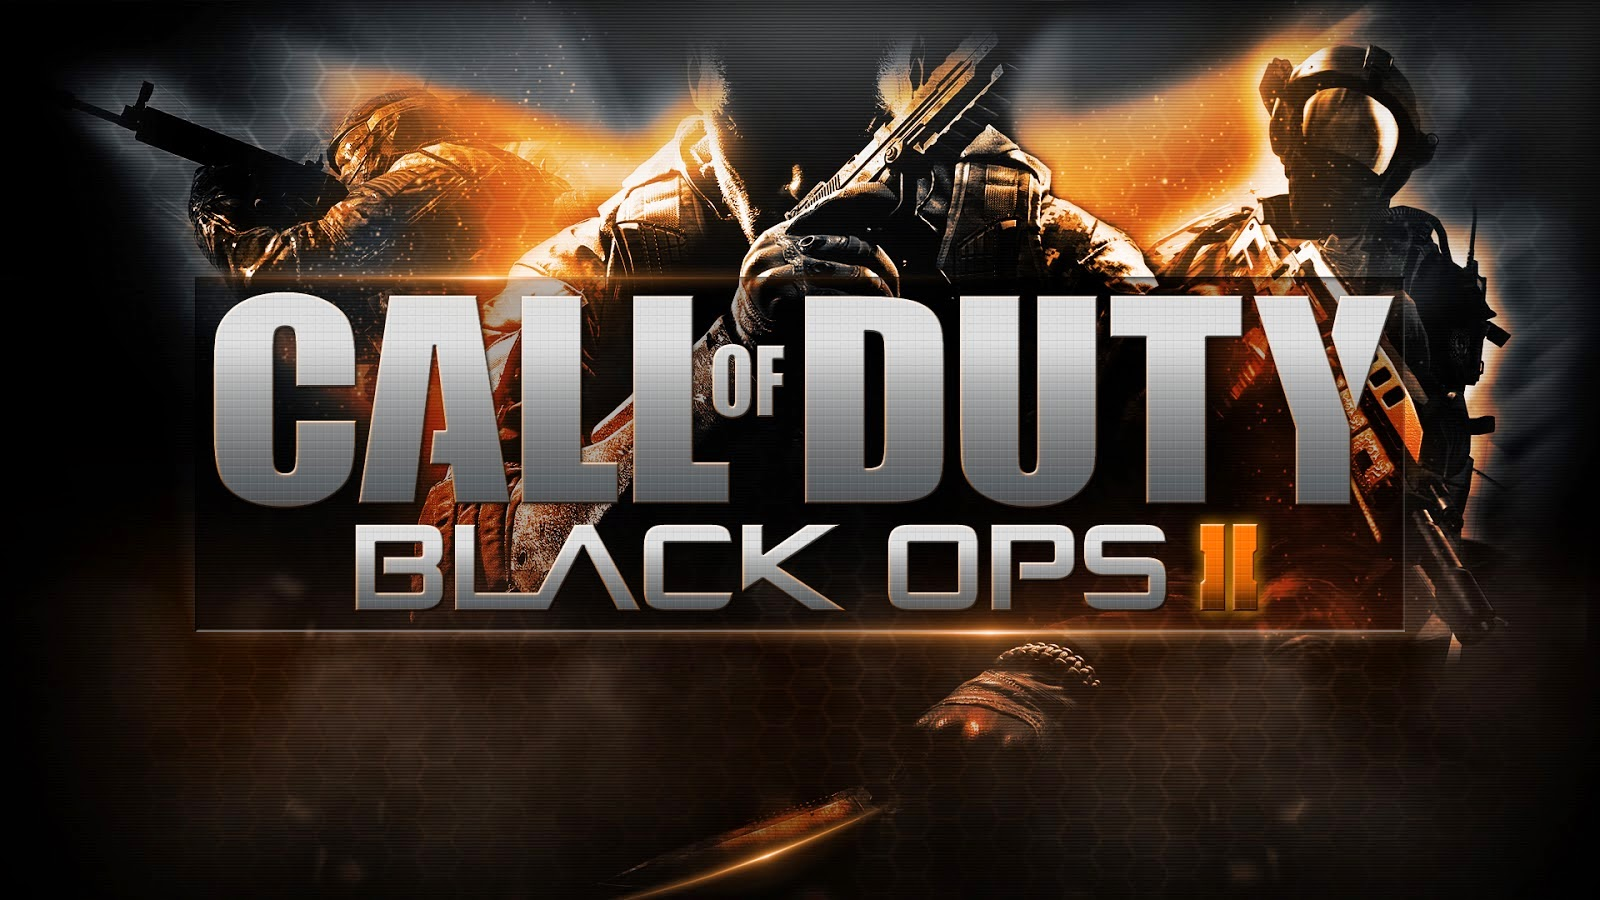 Cod black ops 2 skidrow crack fix download